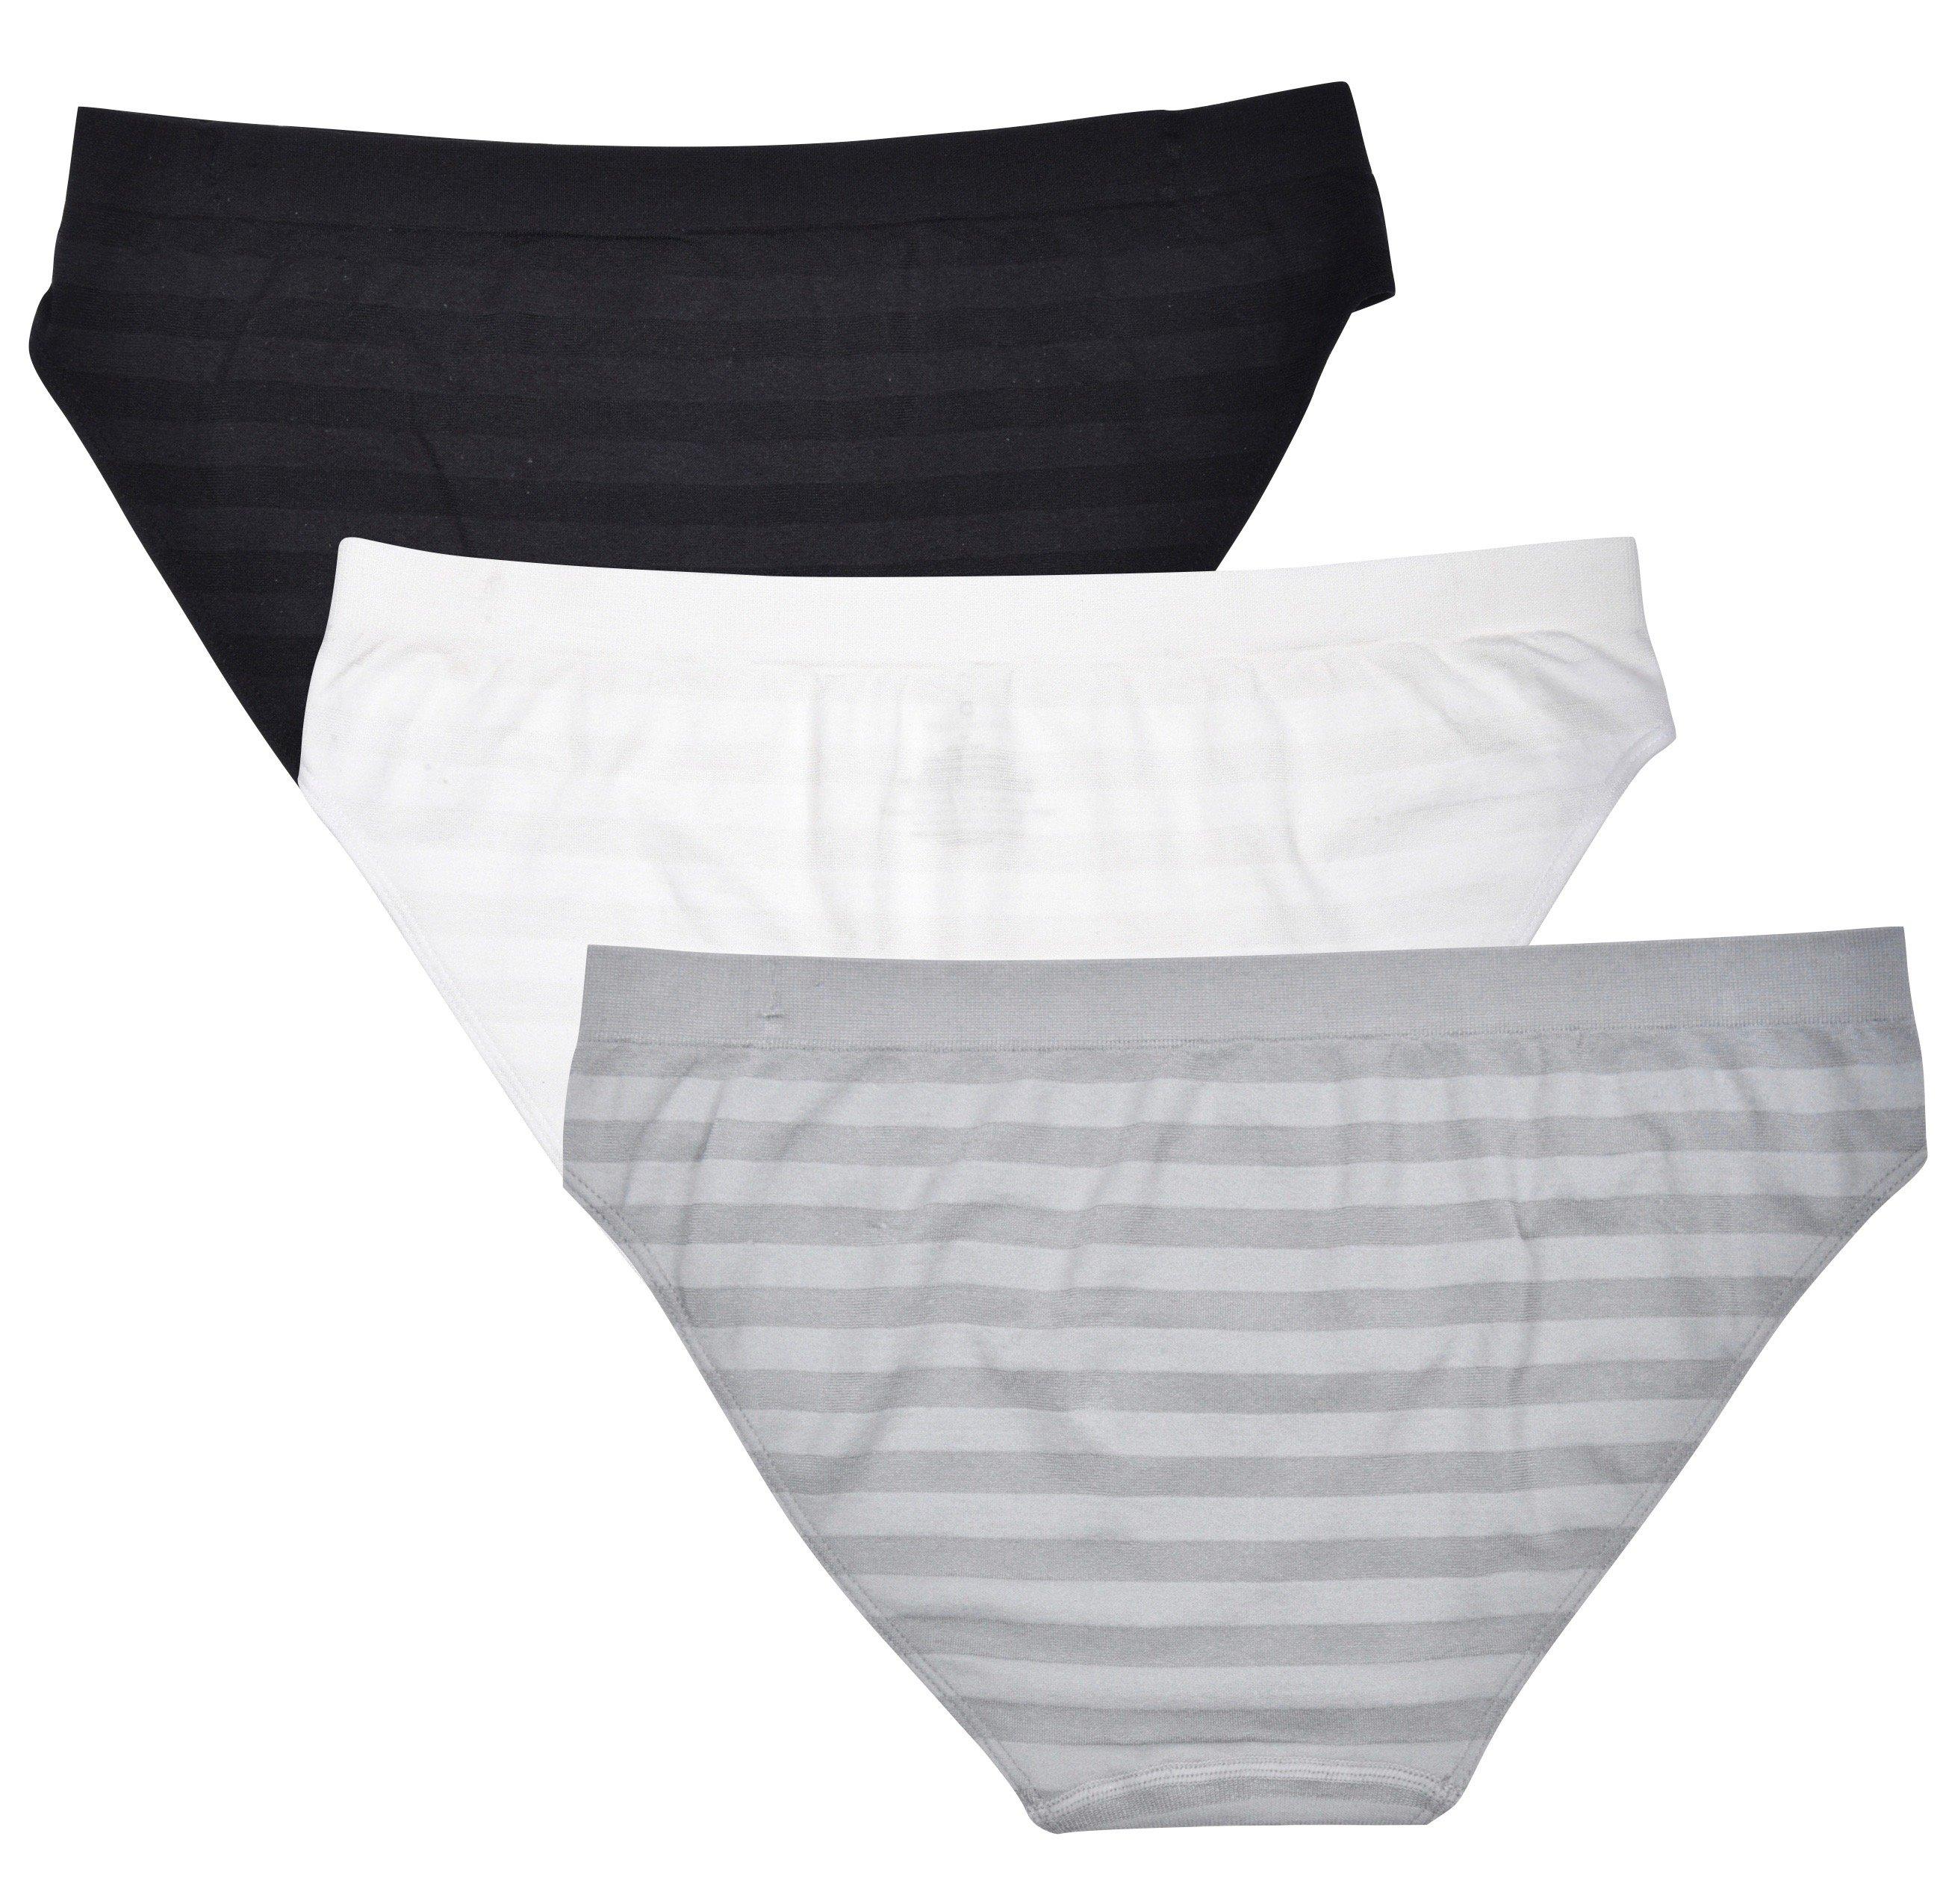 Donna-Loren-Women-039-s-Bikinis-Panties-3-Pack-High-Quality-Underwear-Briefs thumbnail 6